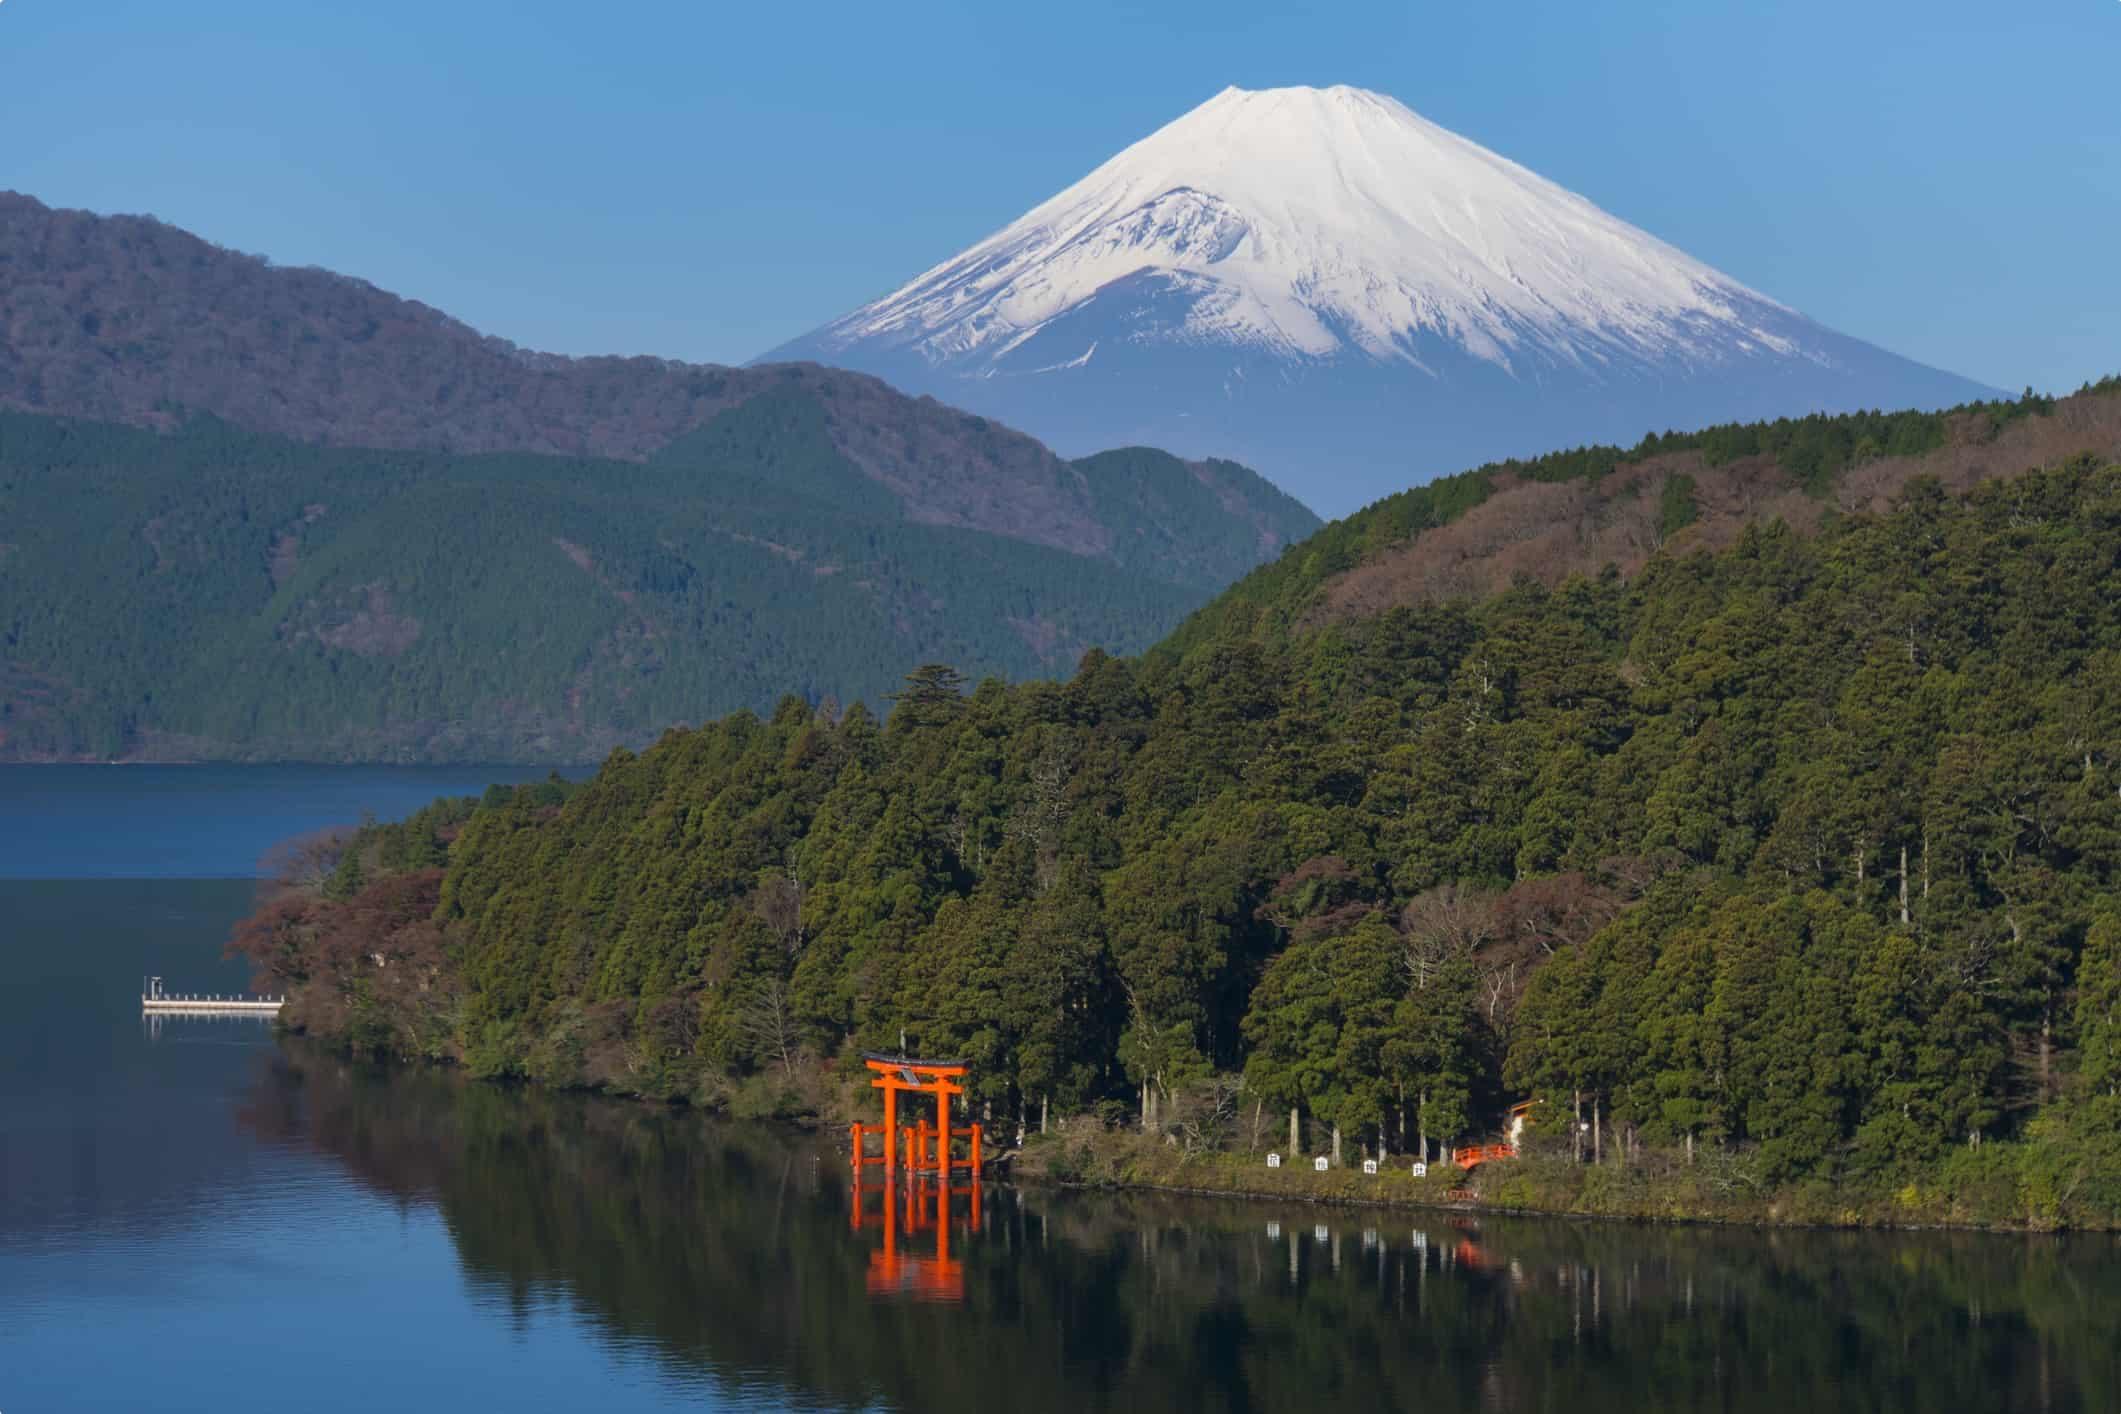 Mt Fuji and Lake Ashi with the red torii gate of Hakone Shrine, Japan